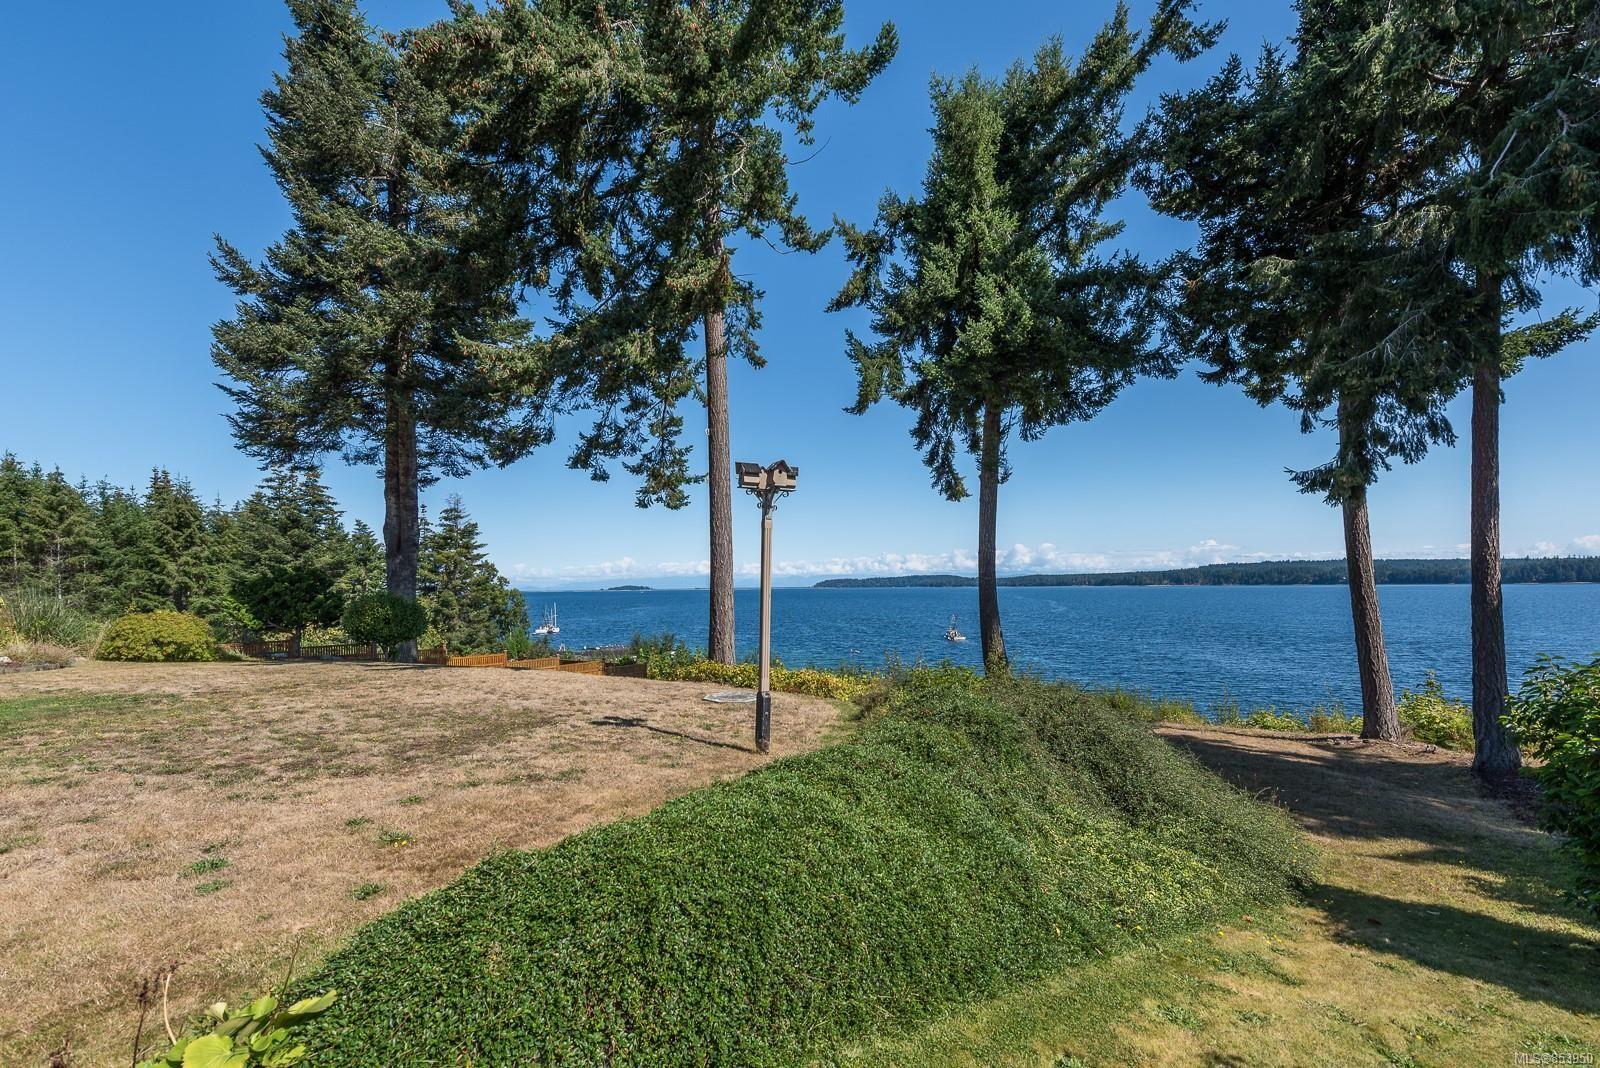 Photo 39: Photos: 5880 GARVIN Rd in : CV Union Bay/Fanny Bay House for sale (Comox Valley)  : MLS®# 853950